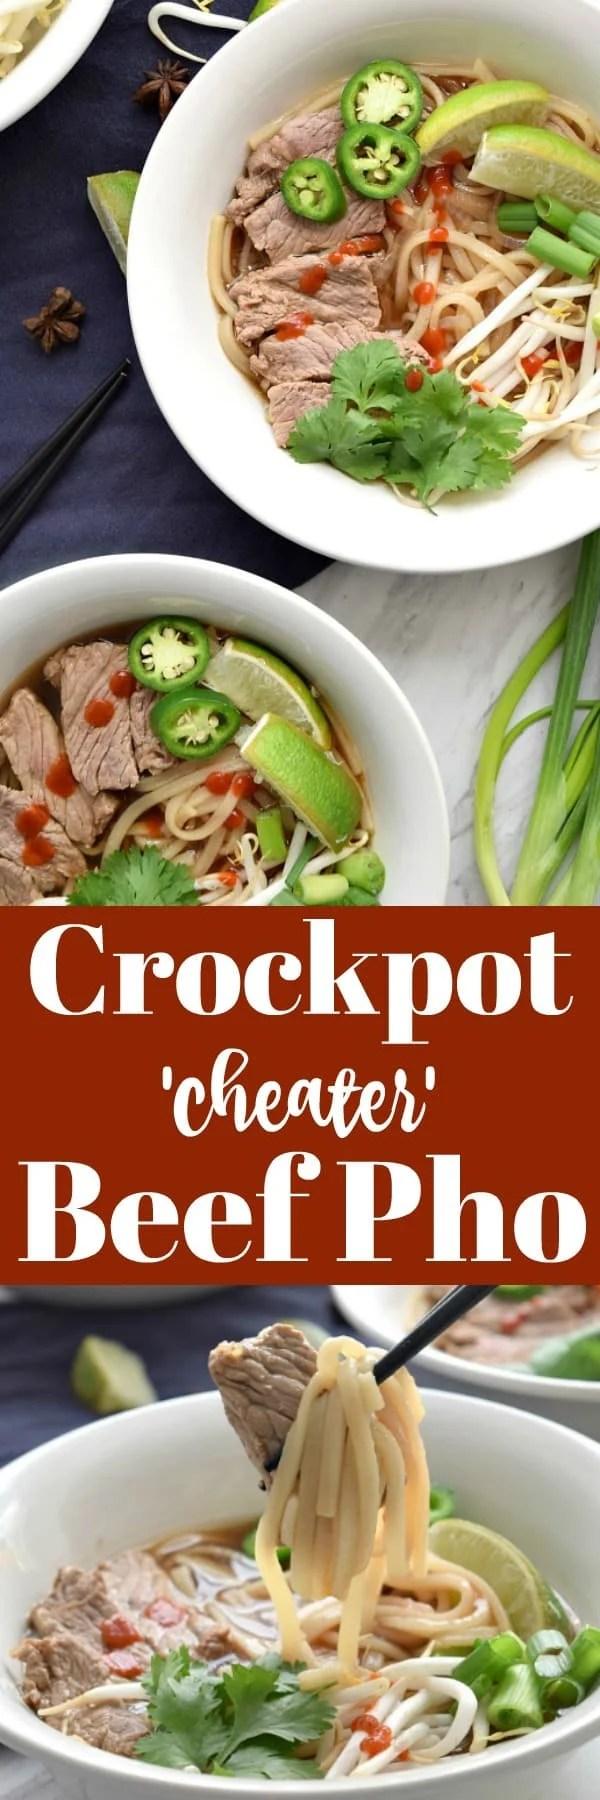 Crockpot 'Cheater' Beef Pho